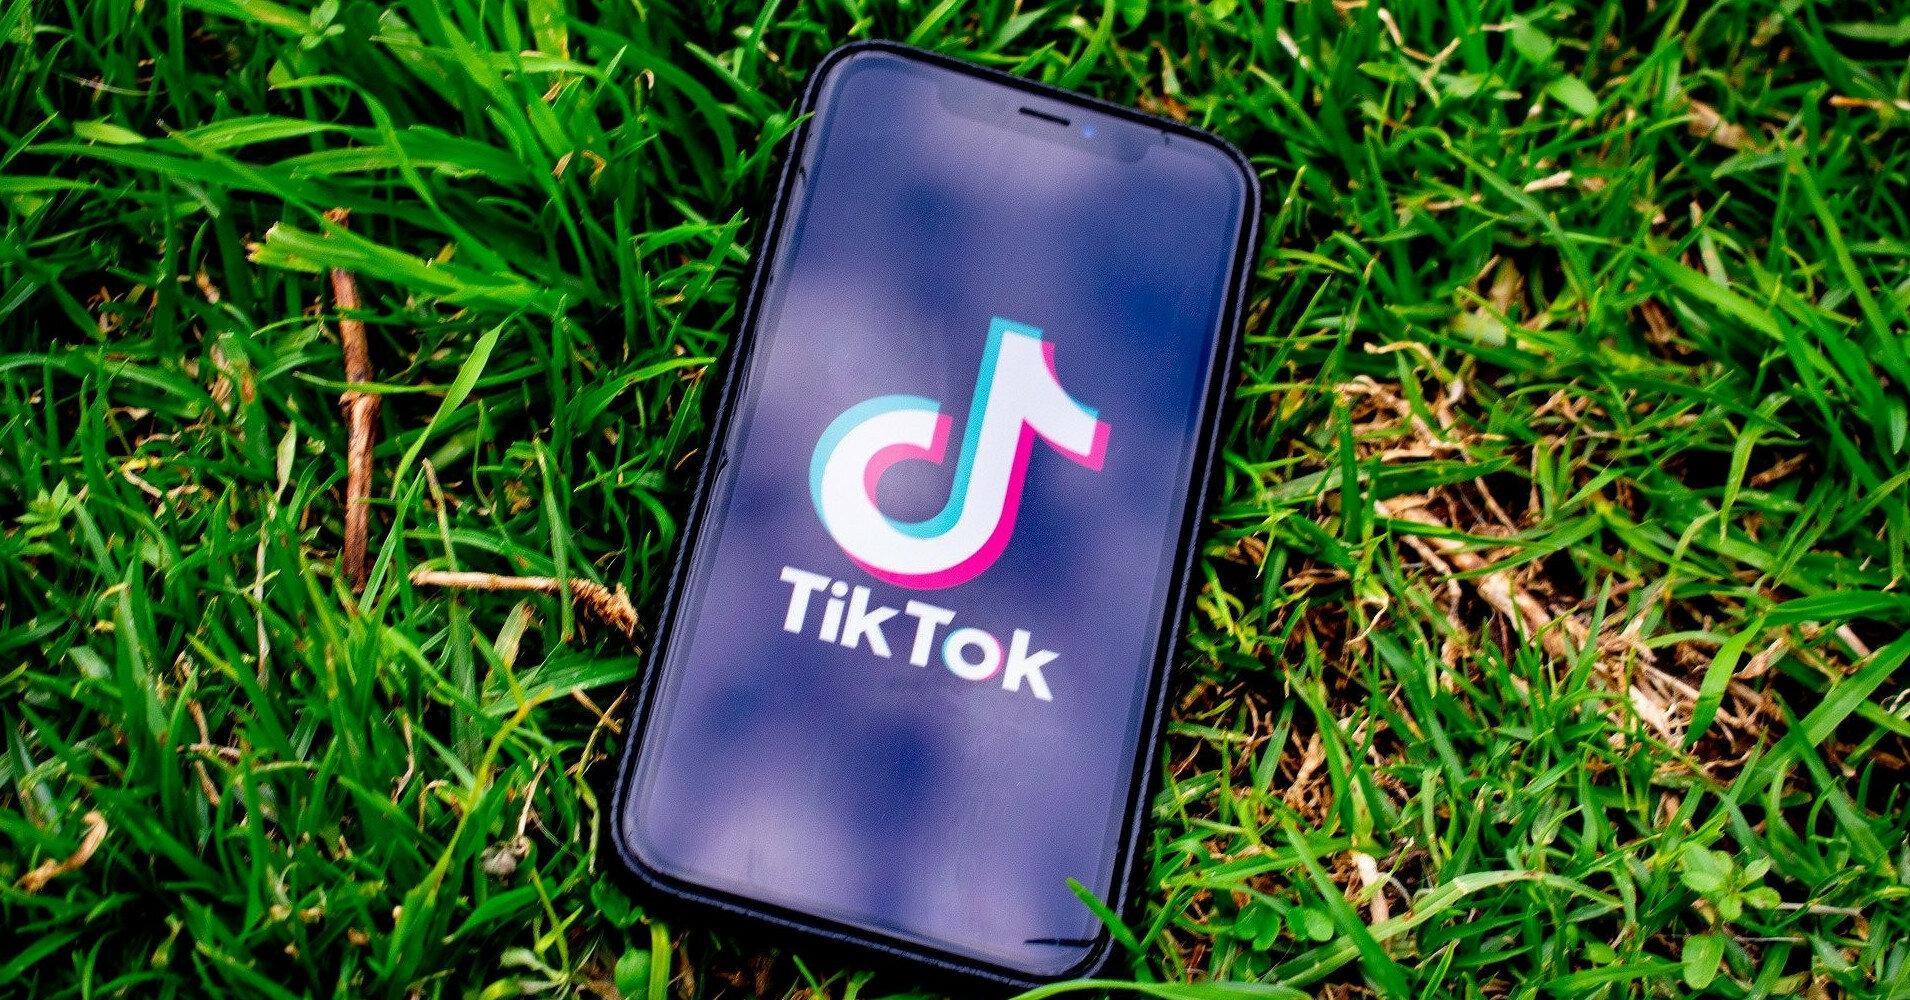 В Бангладеш изнасиловали школьницу под видом съемок для TikTok